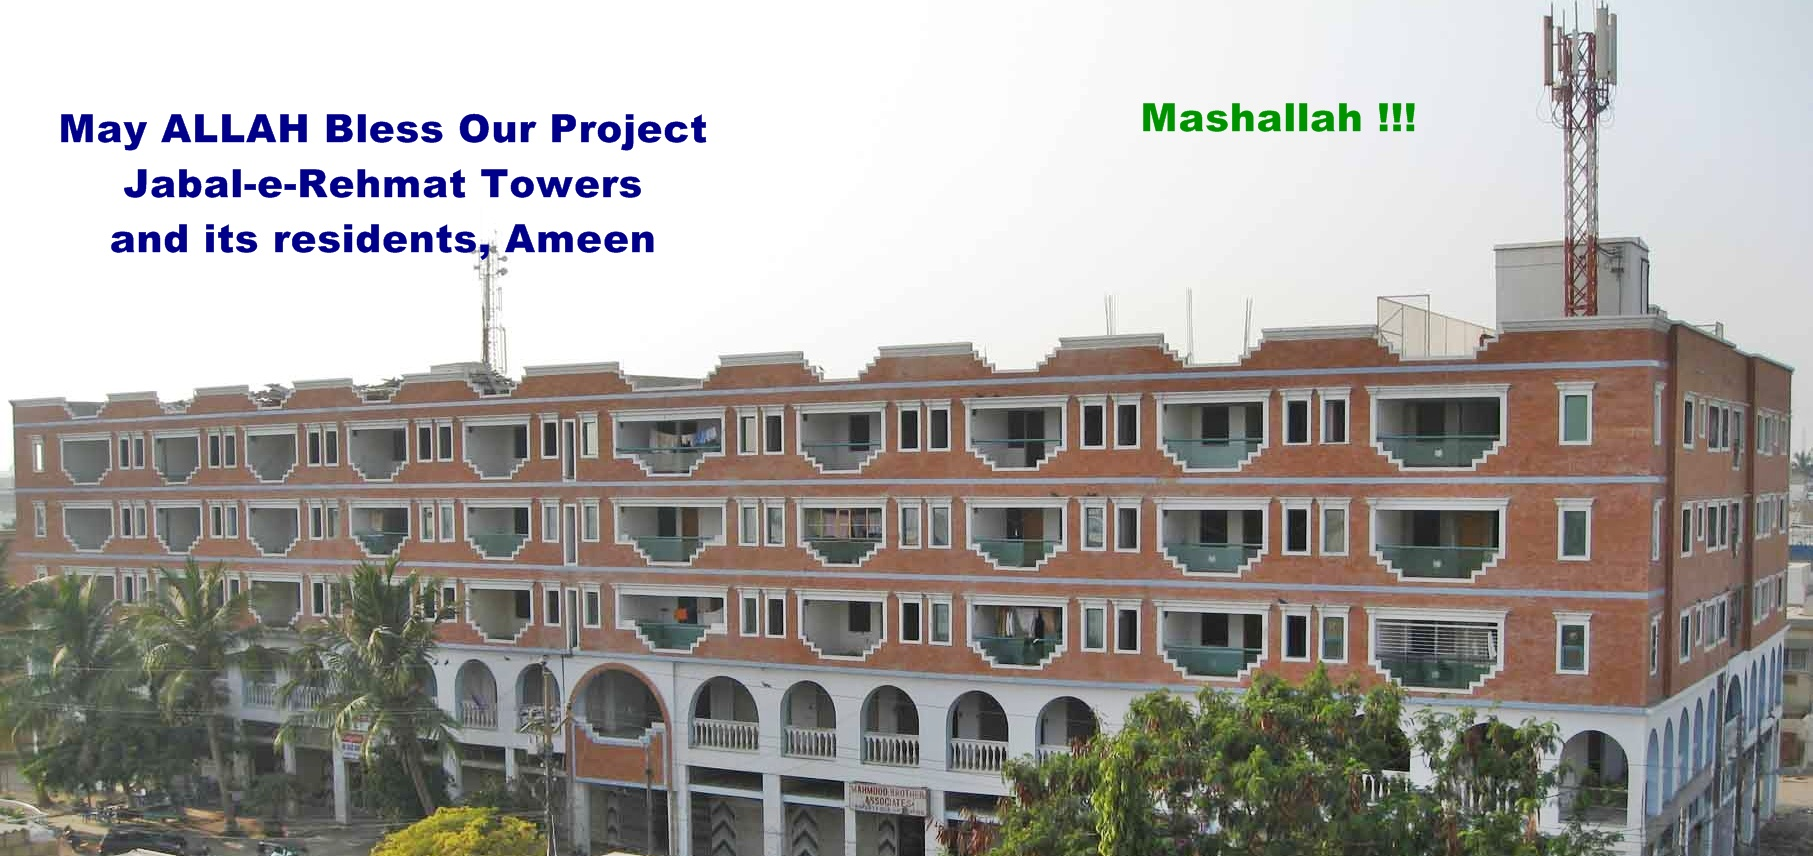 Jabal-e-Rehmat Towers